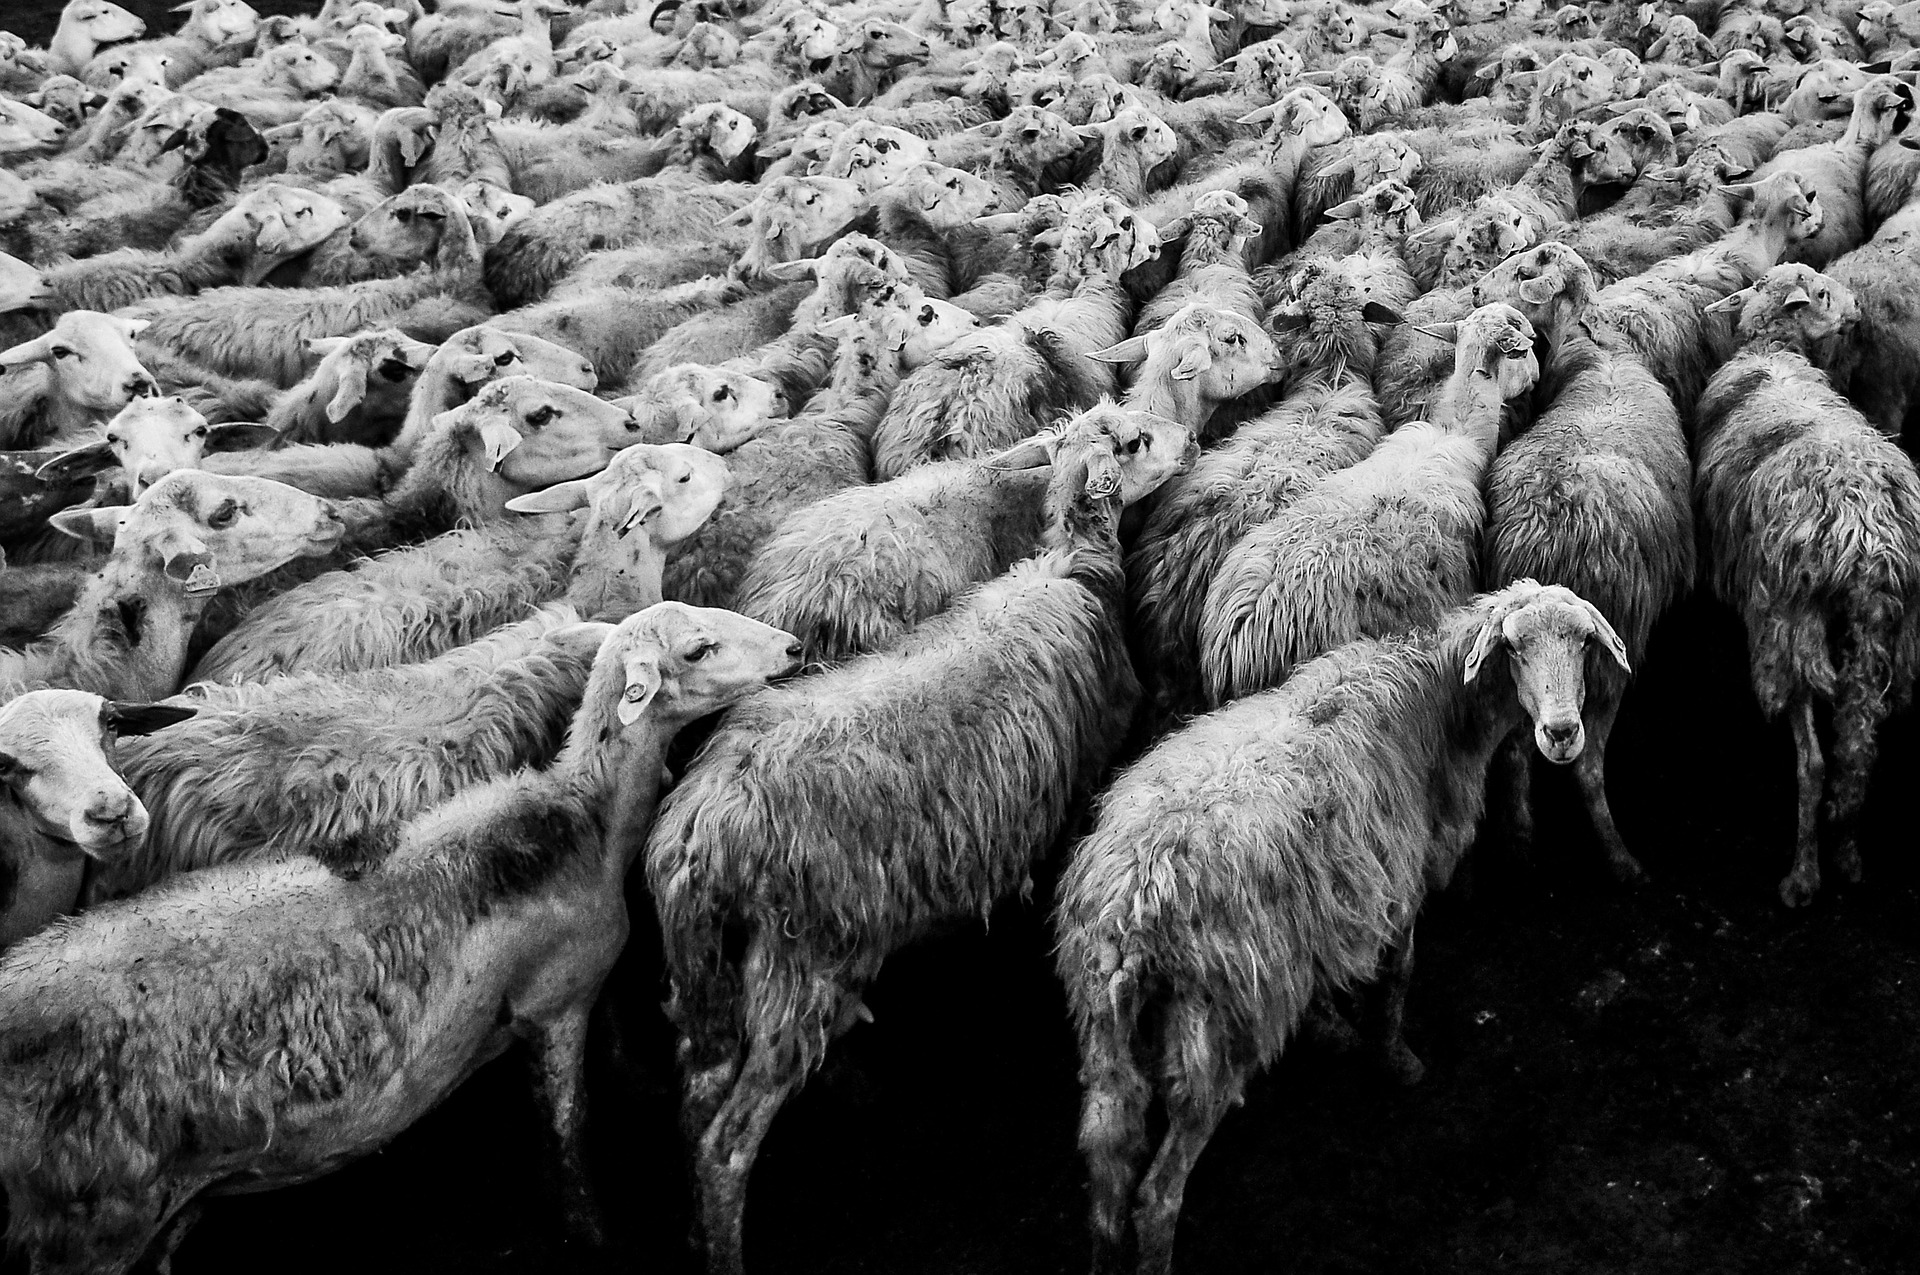 sheep-1148999_1920